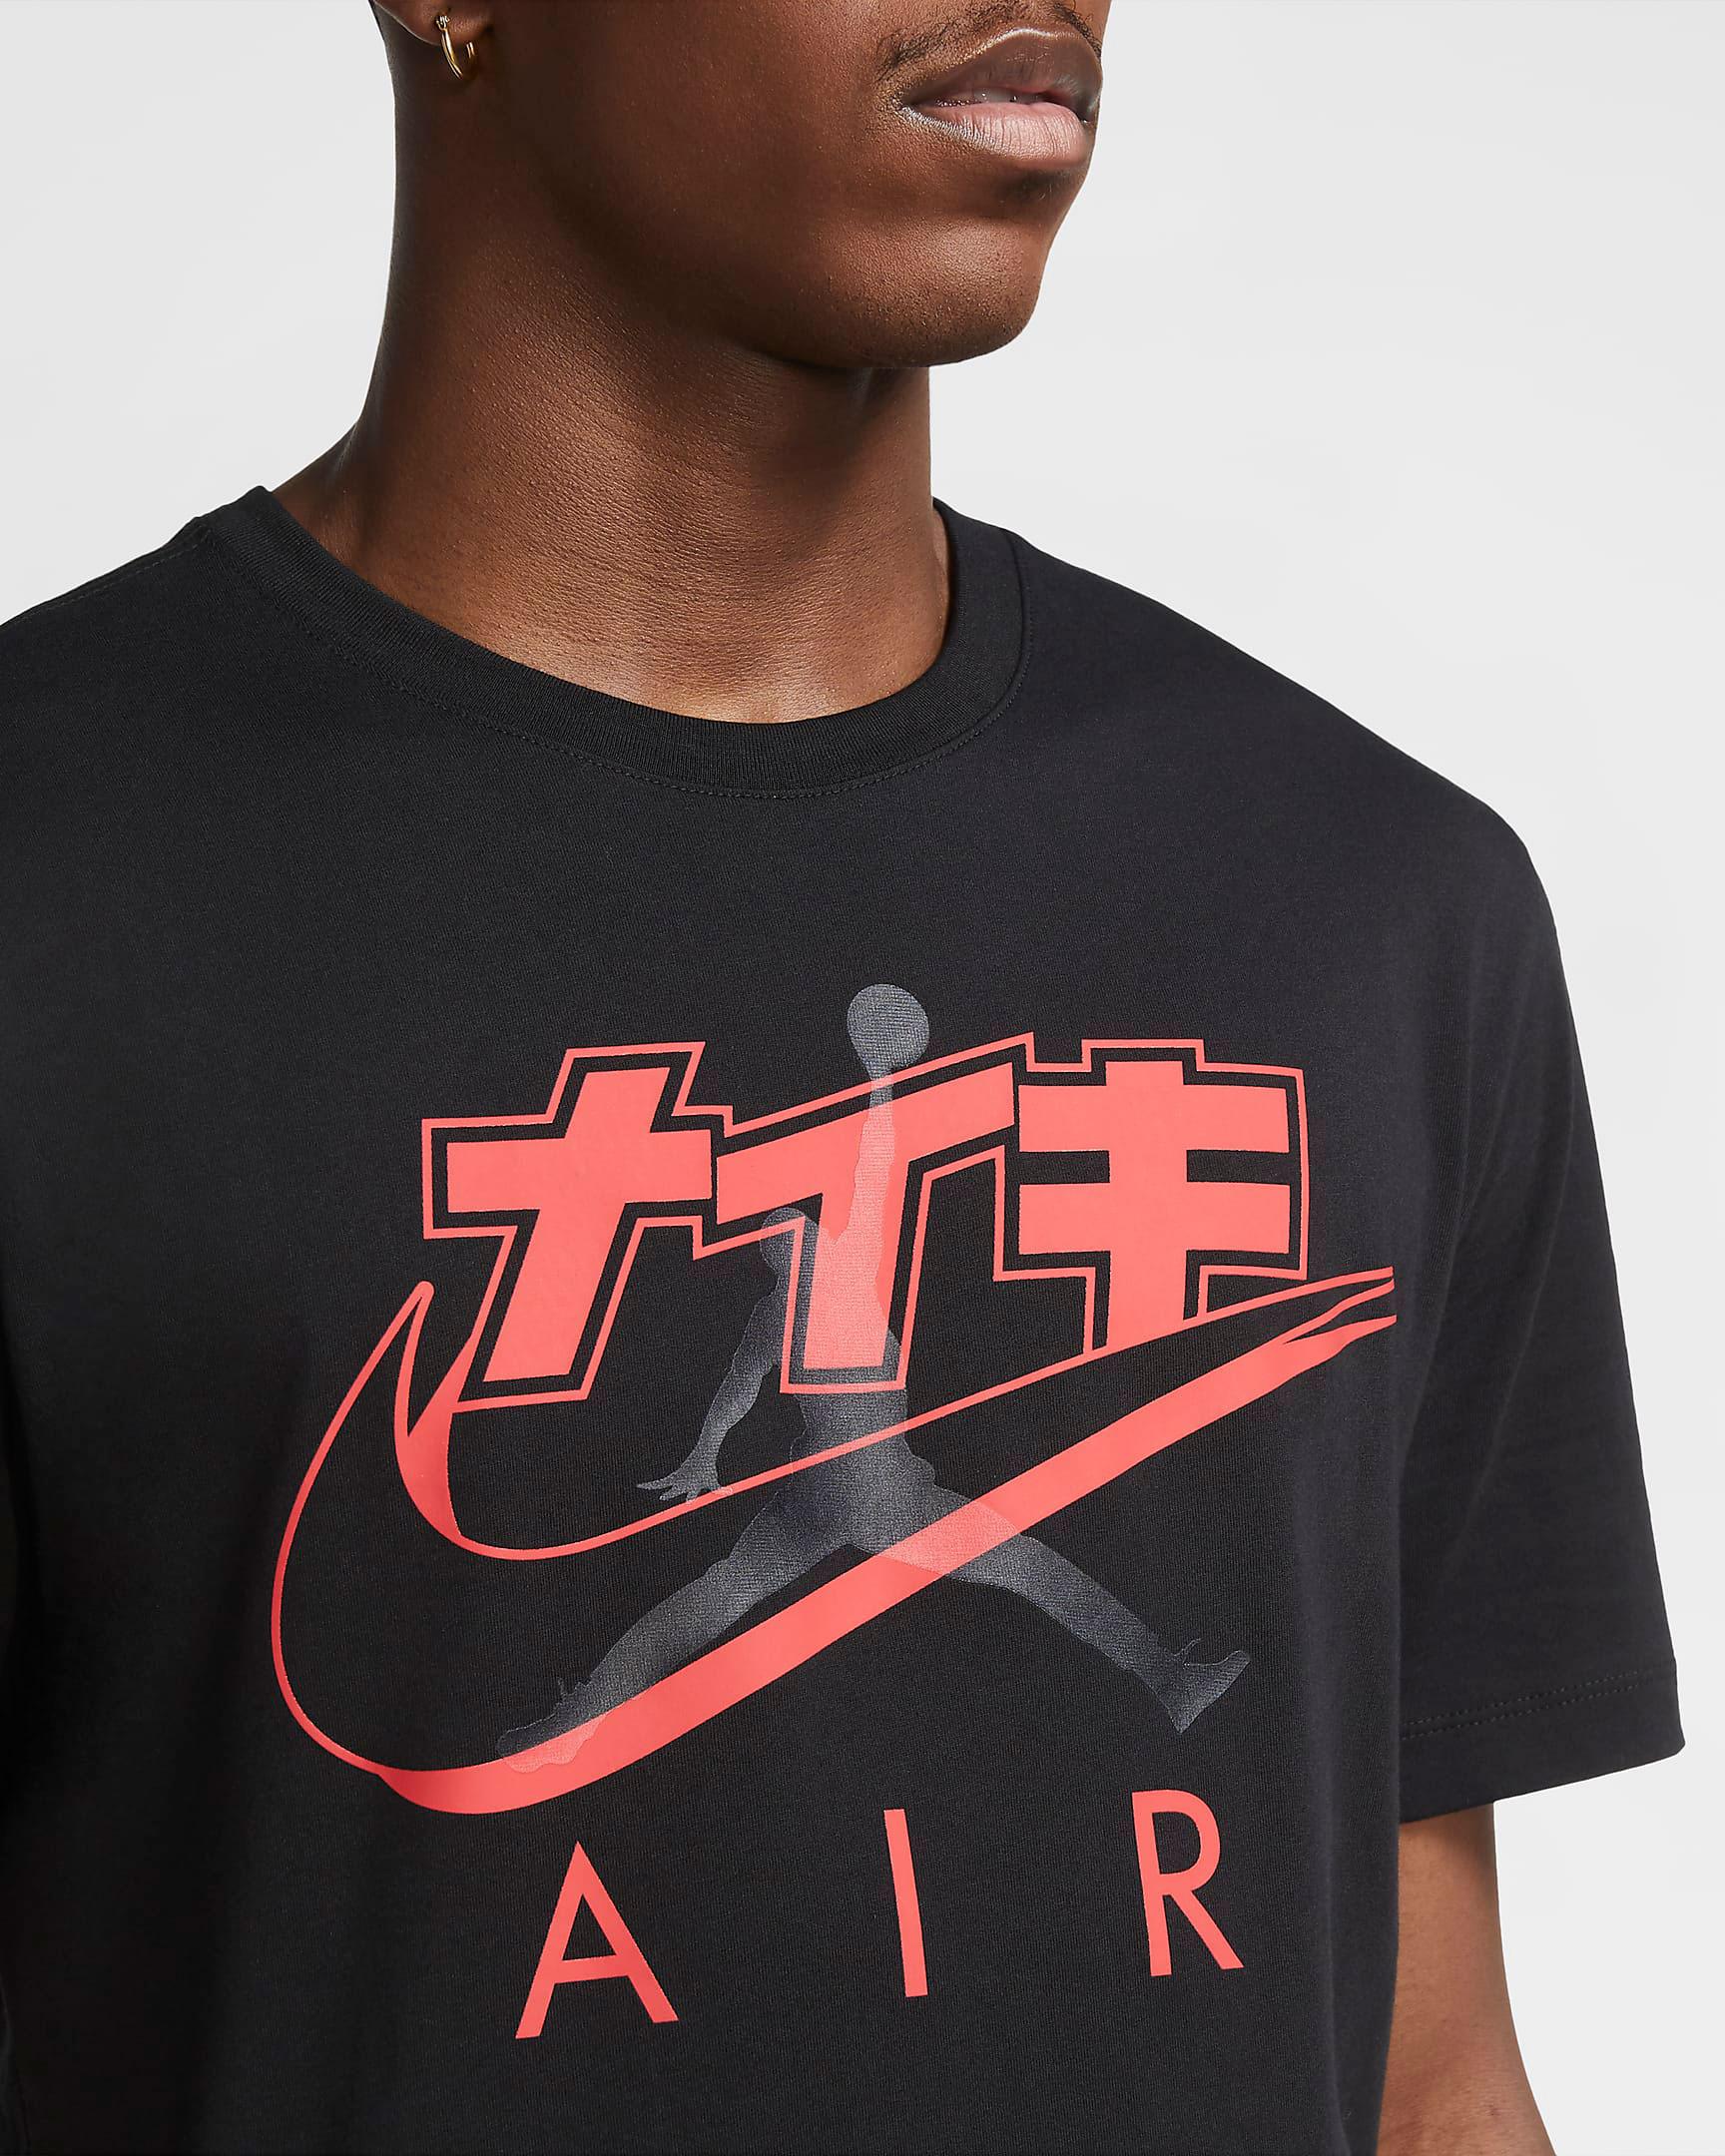 air-jordan-3-denim-fire-red-japan-shirt-black-2